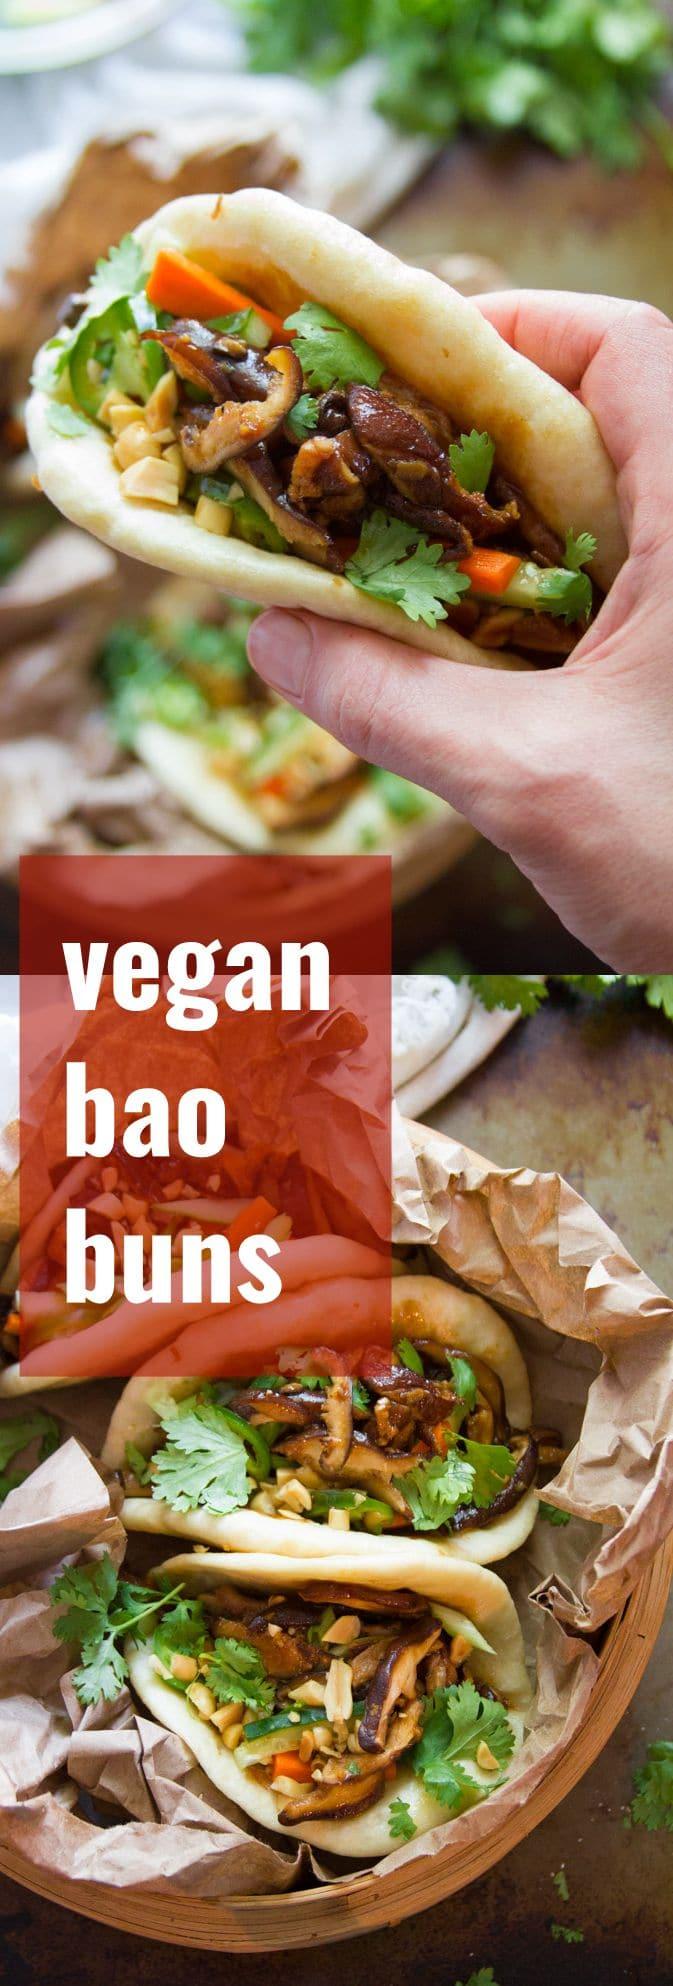 Shiitake Mushroom Vegan Bao Buns